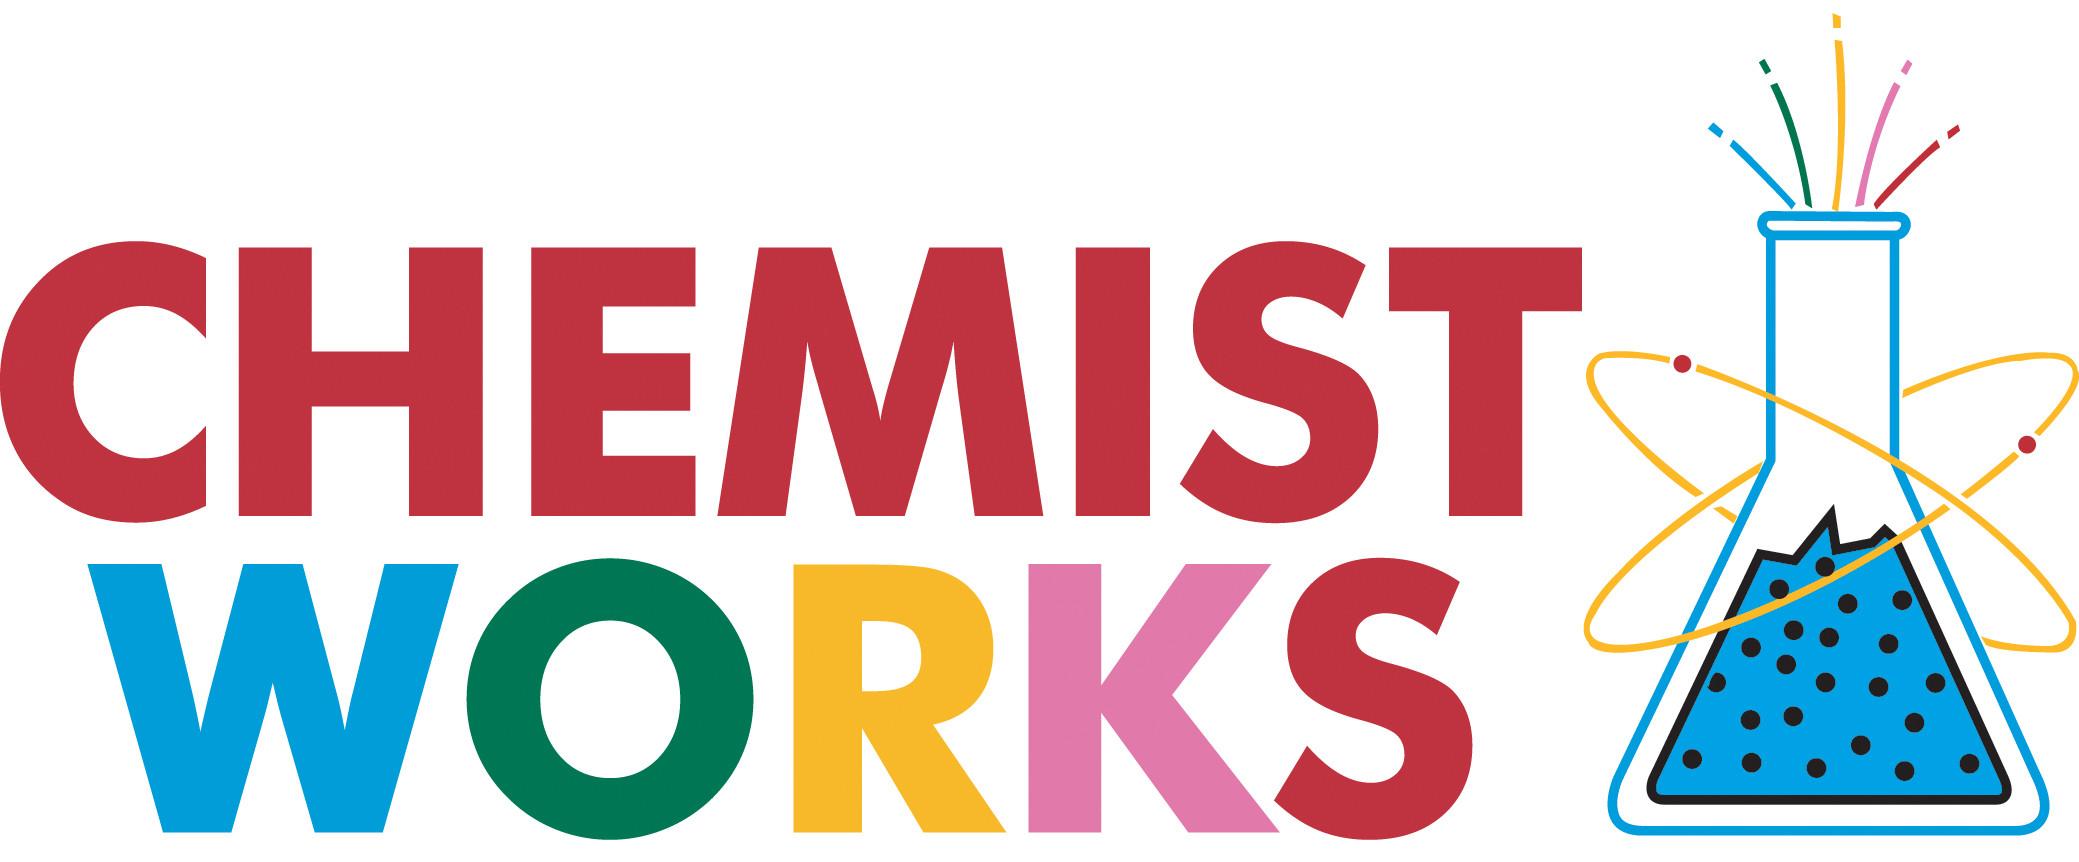 Chemistworks logo2.jpg